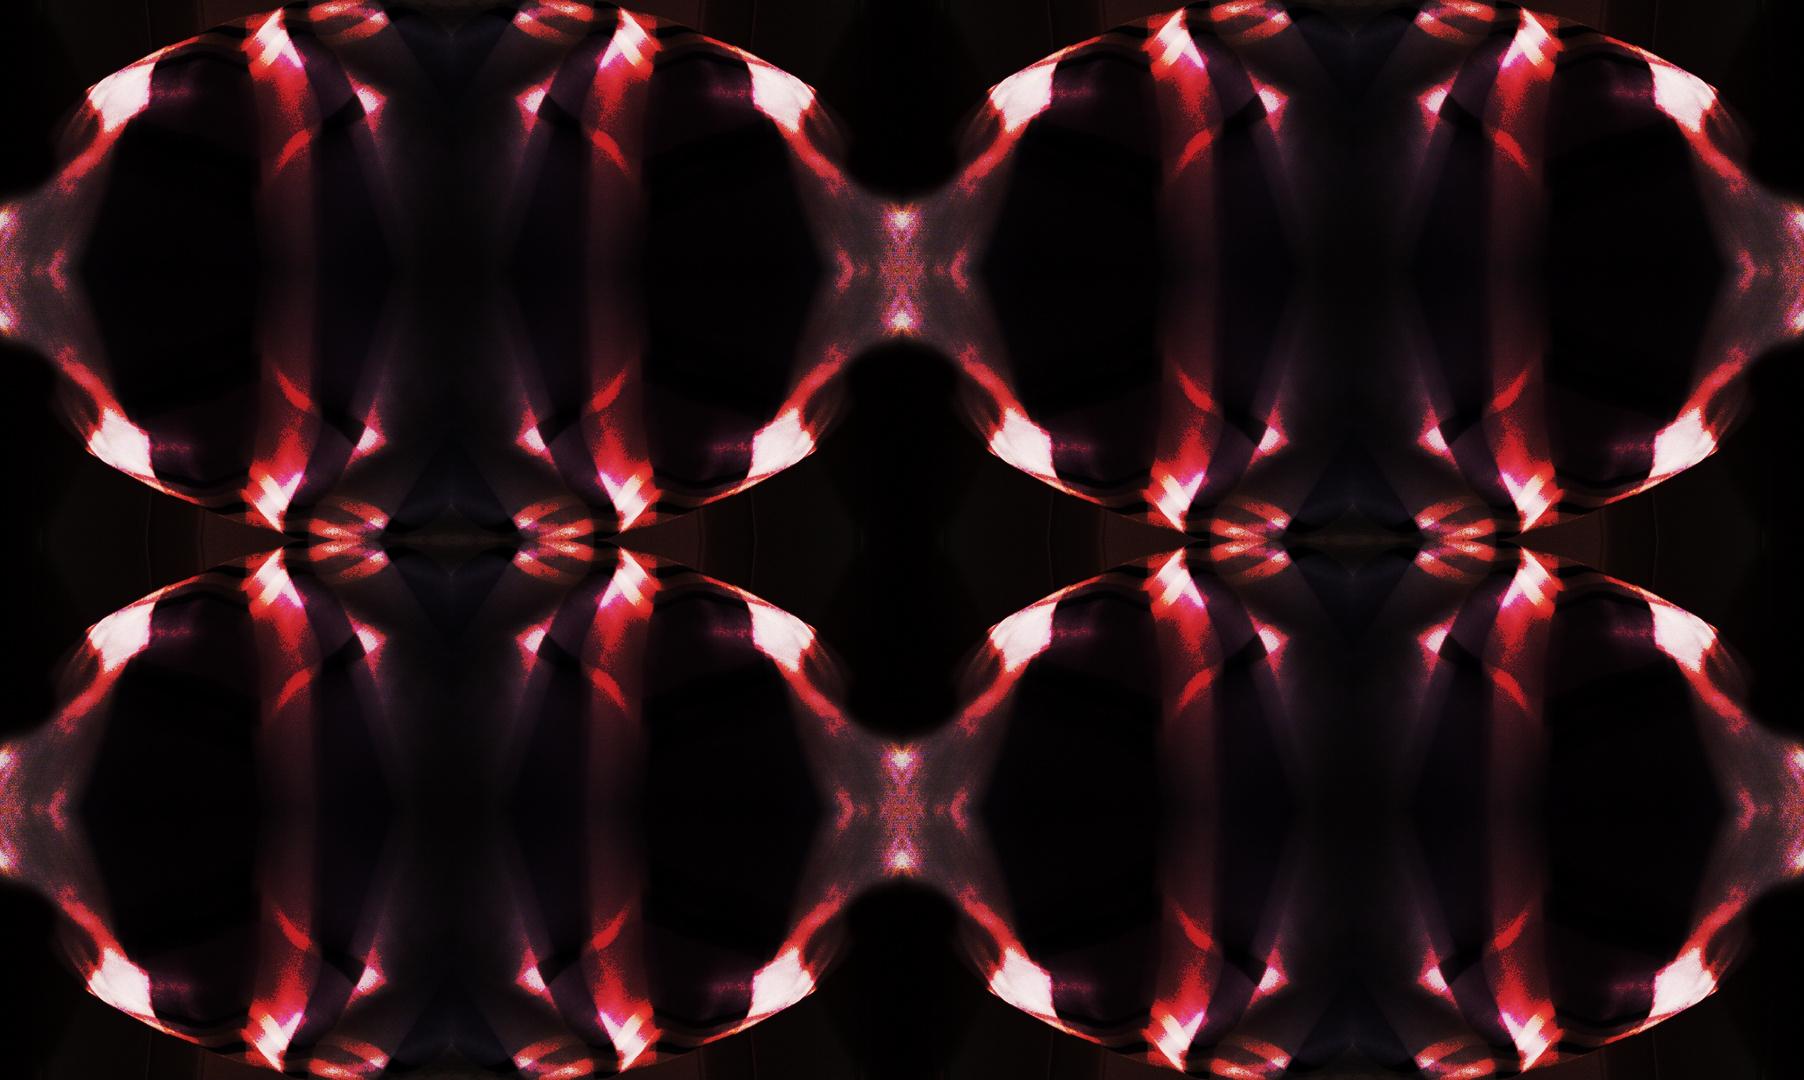 Kaleidoskop zwei